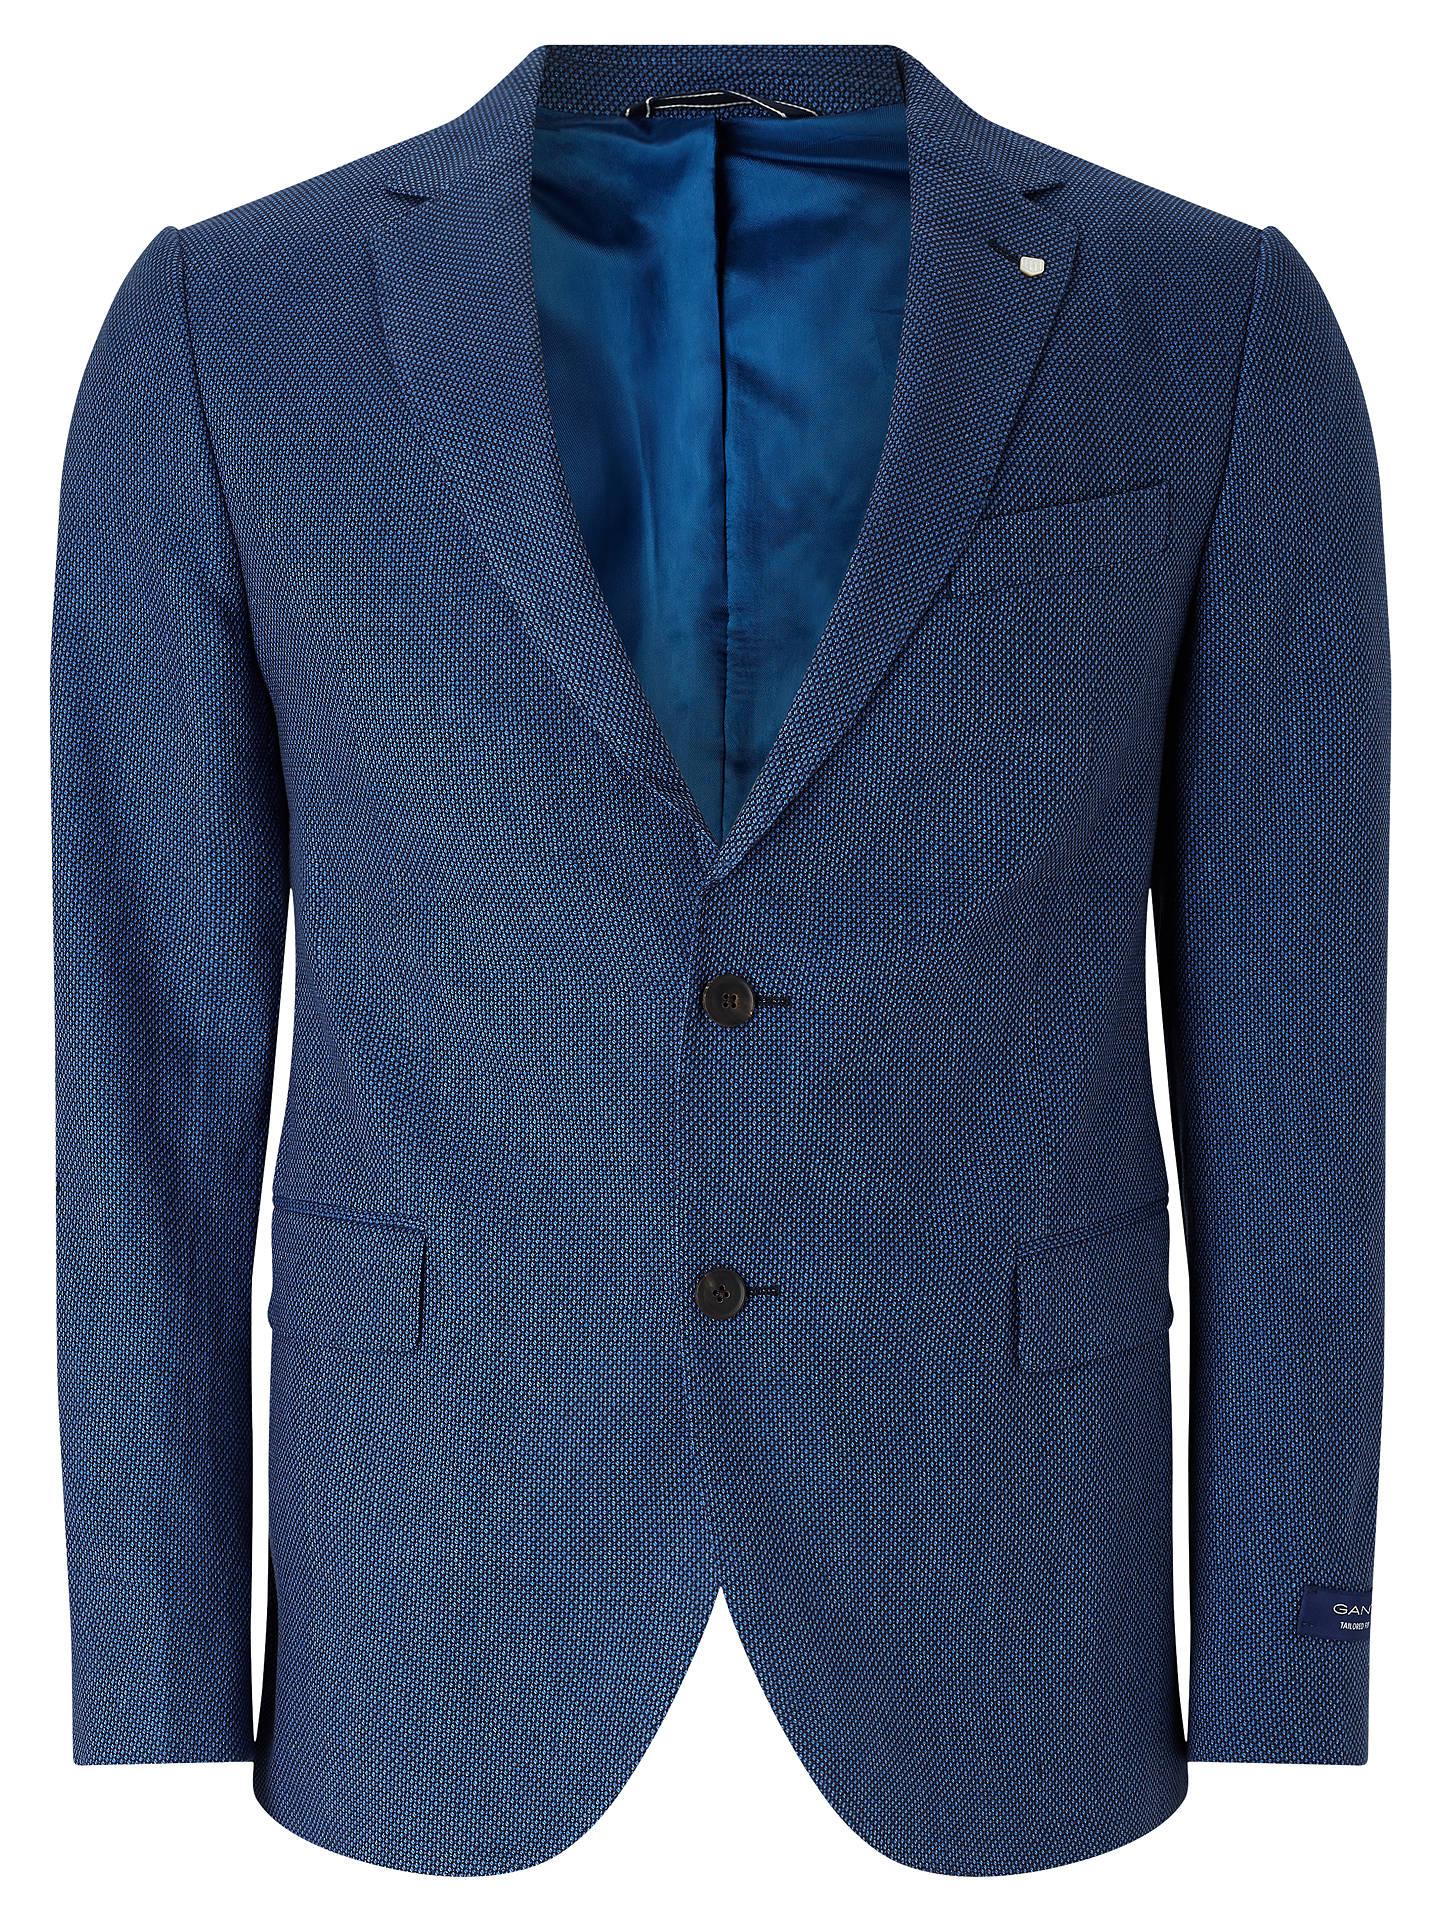 a205ef6107708 Gant Birdseye Linen-Blend Tailored Blazer, Navy at John Lewis & Partners